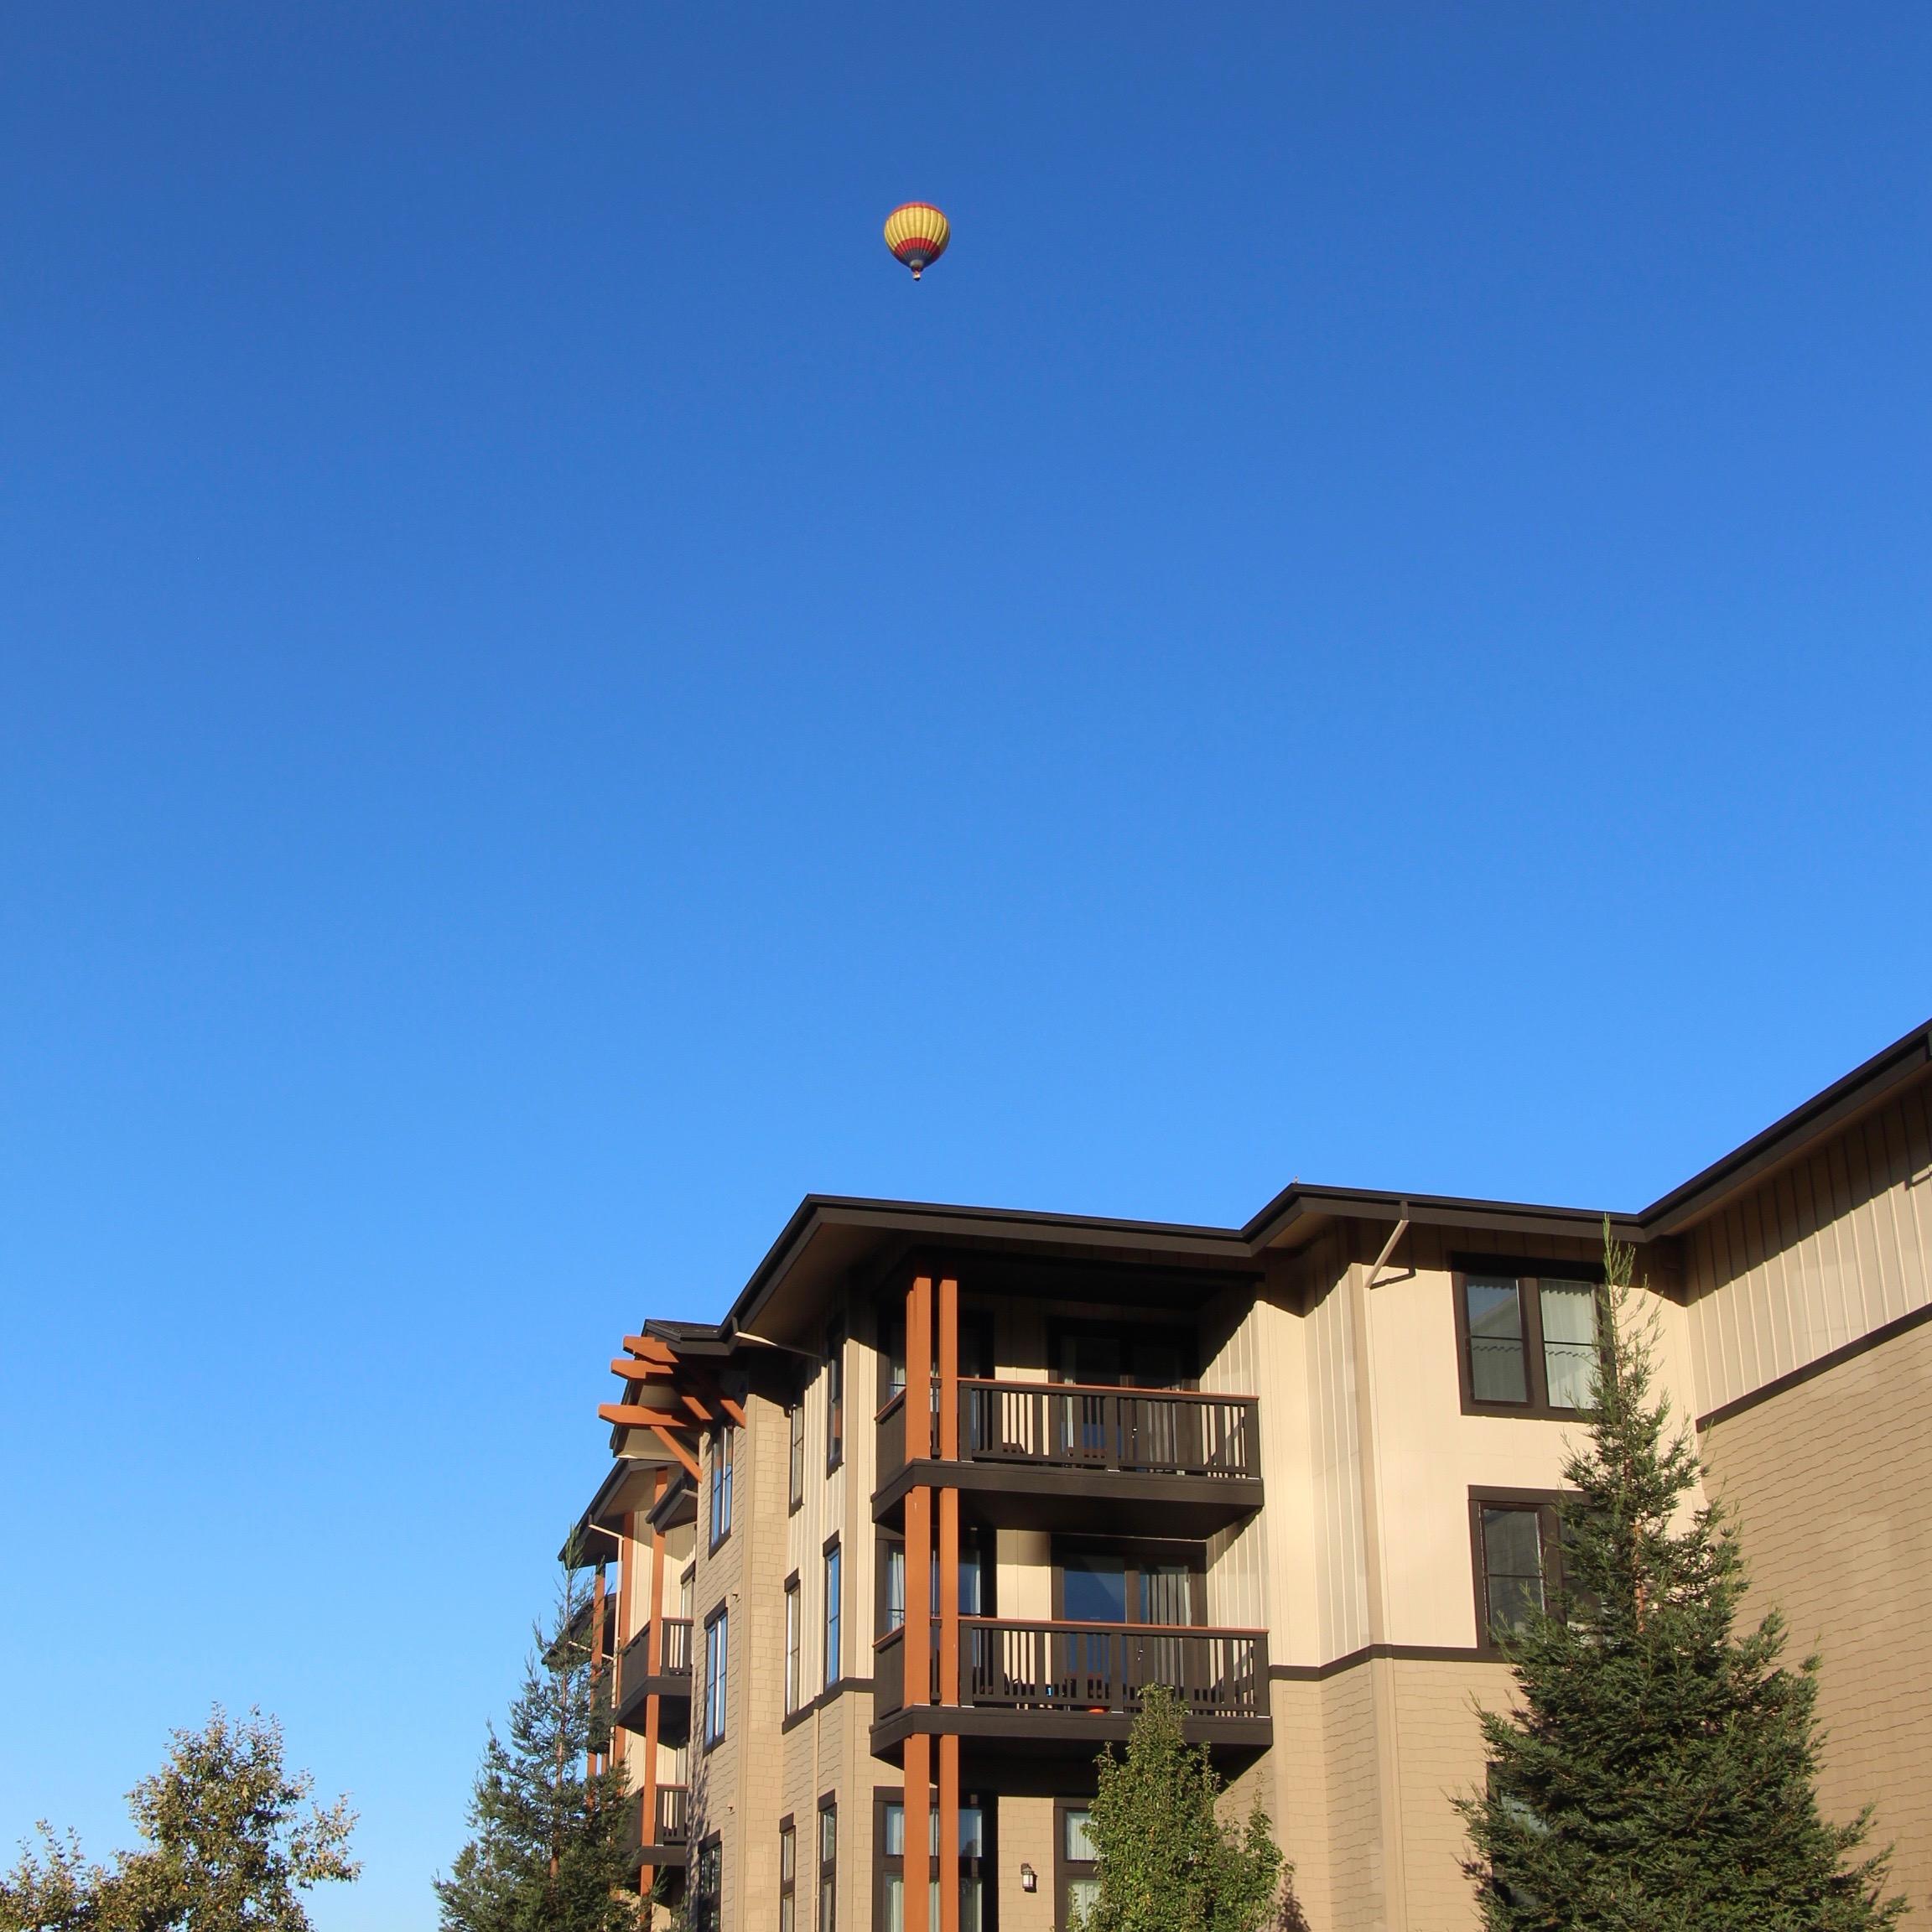 Hot Air Balloon Napa California